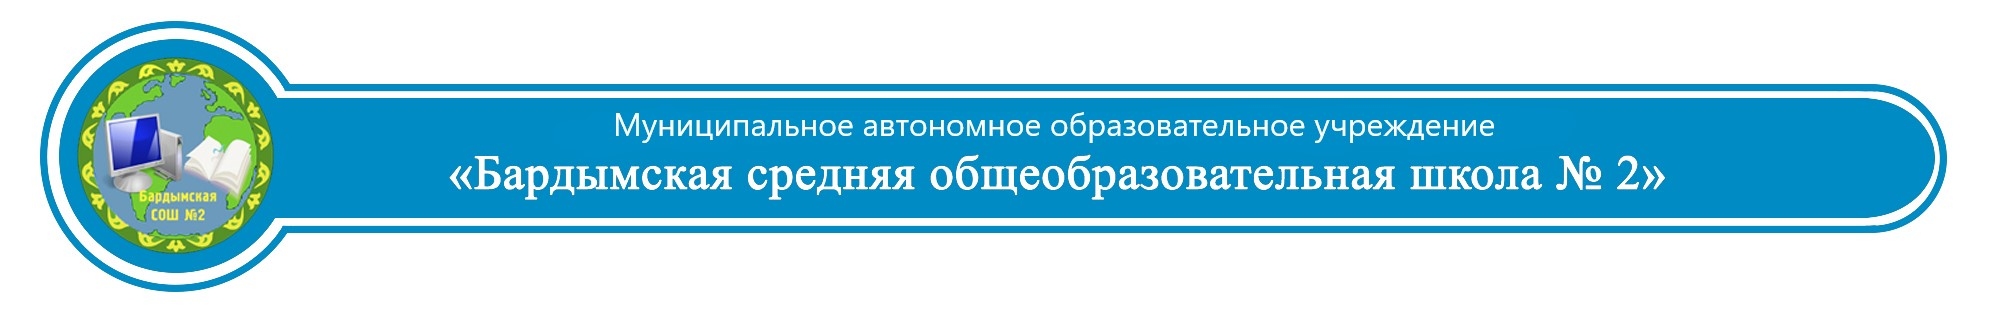 Бардымская СОШ №2